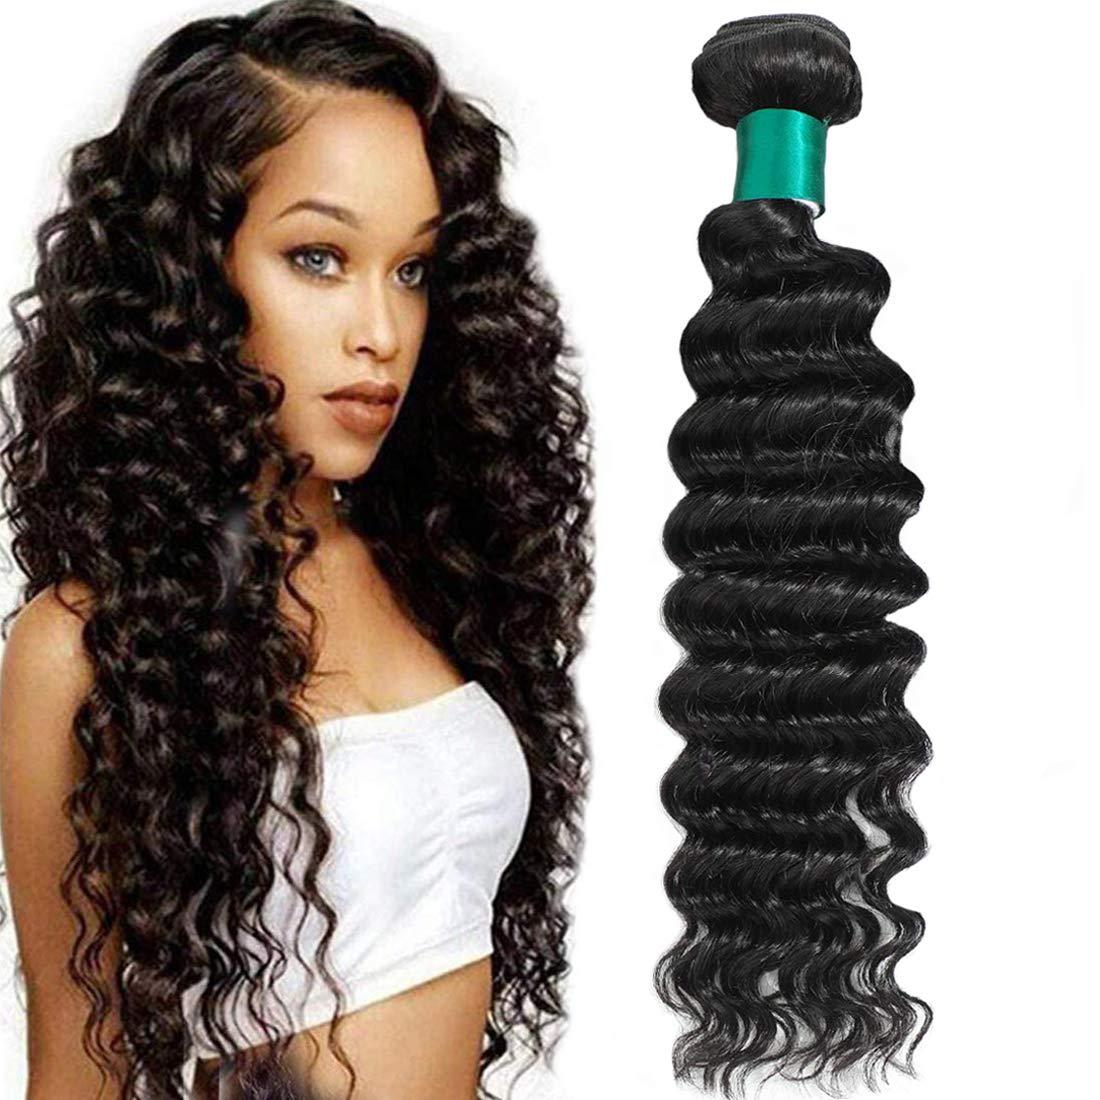 Lizourey All Popular popular items free shipping Hair Brazilian Virgin Human One Bun Deep Wave